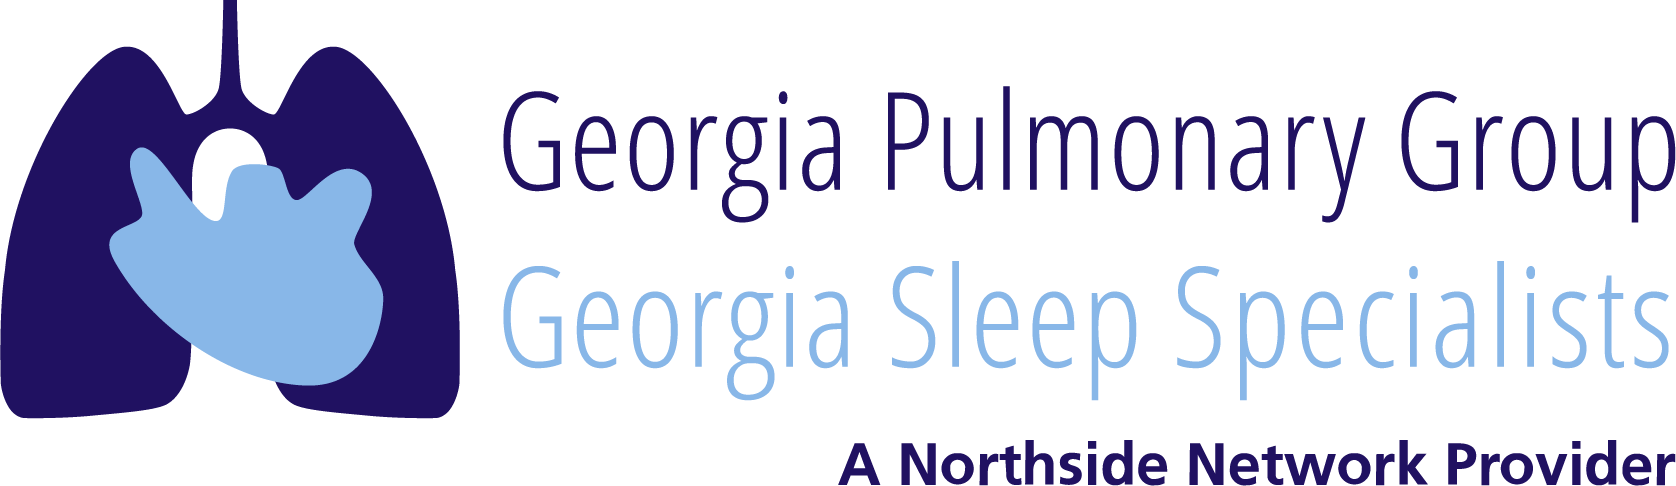 GPG_Logo_2020